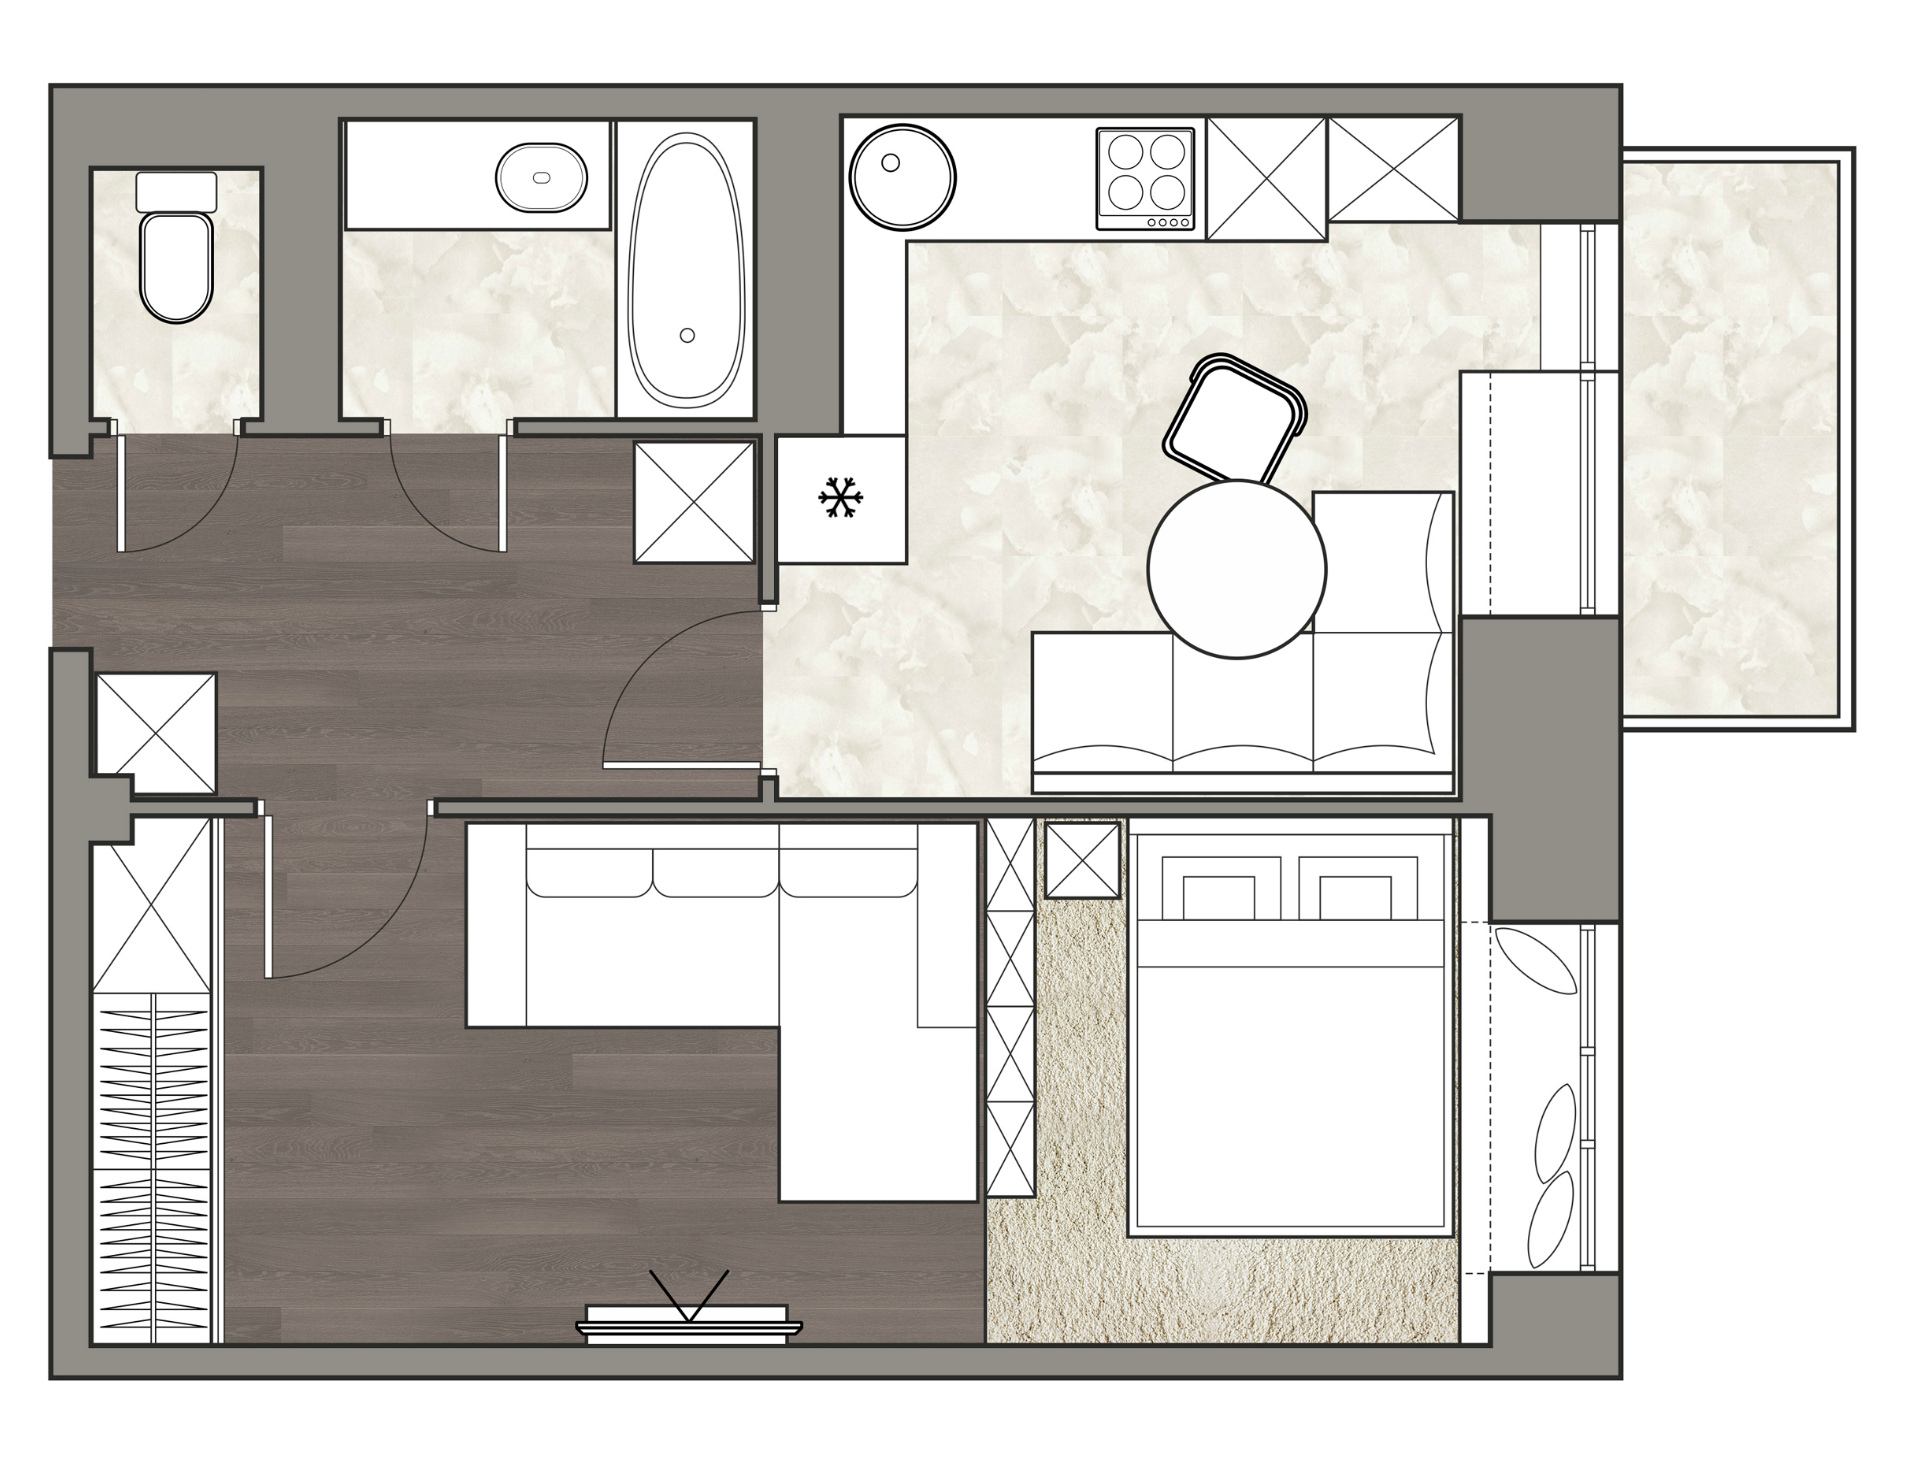 План квартиры 40 кв. метров